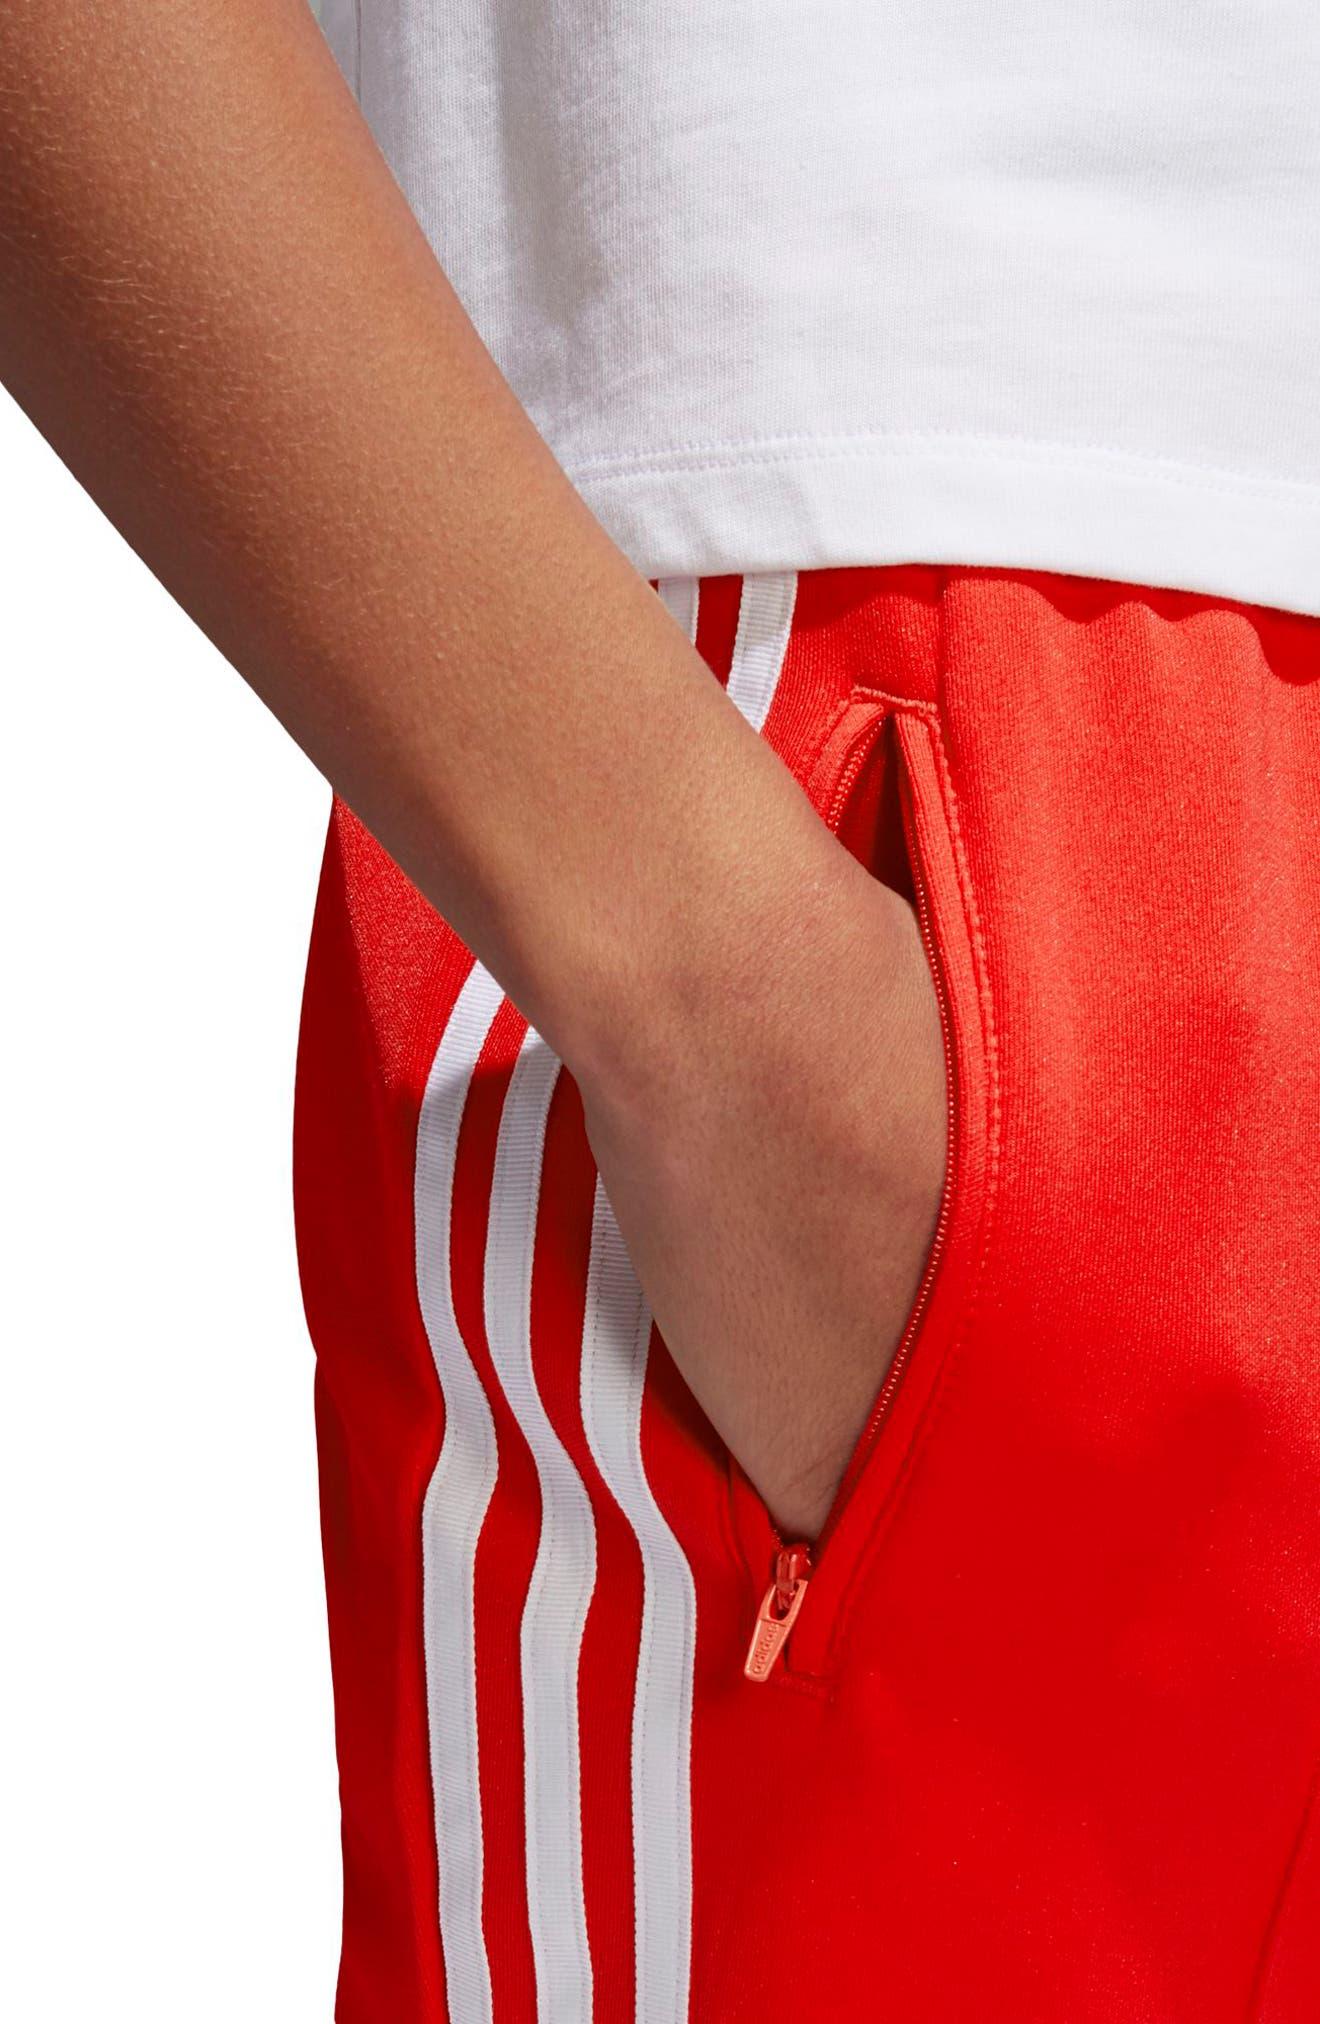 ,                             adidas SST Track Pants,                             Alternate thumbnail 74, color,                             600